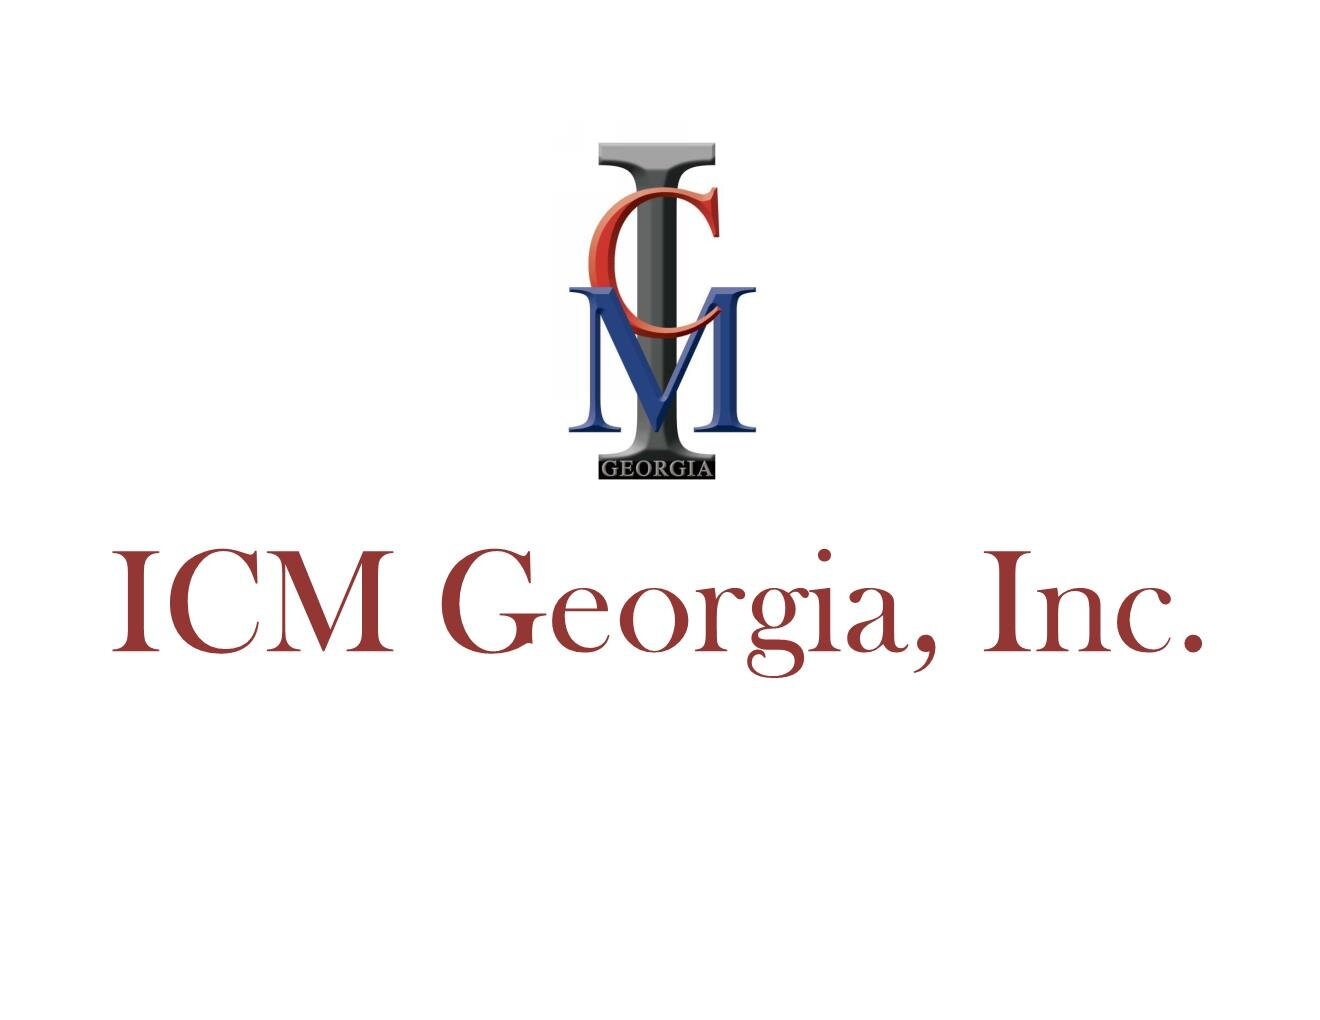 ICM Georgia - hole sponsorship logo 2.jpg